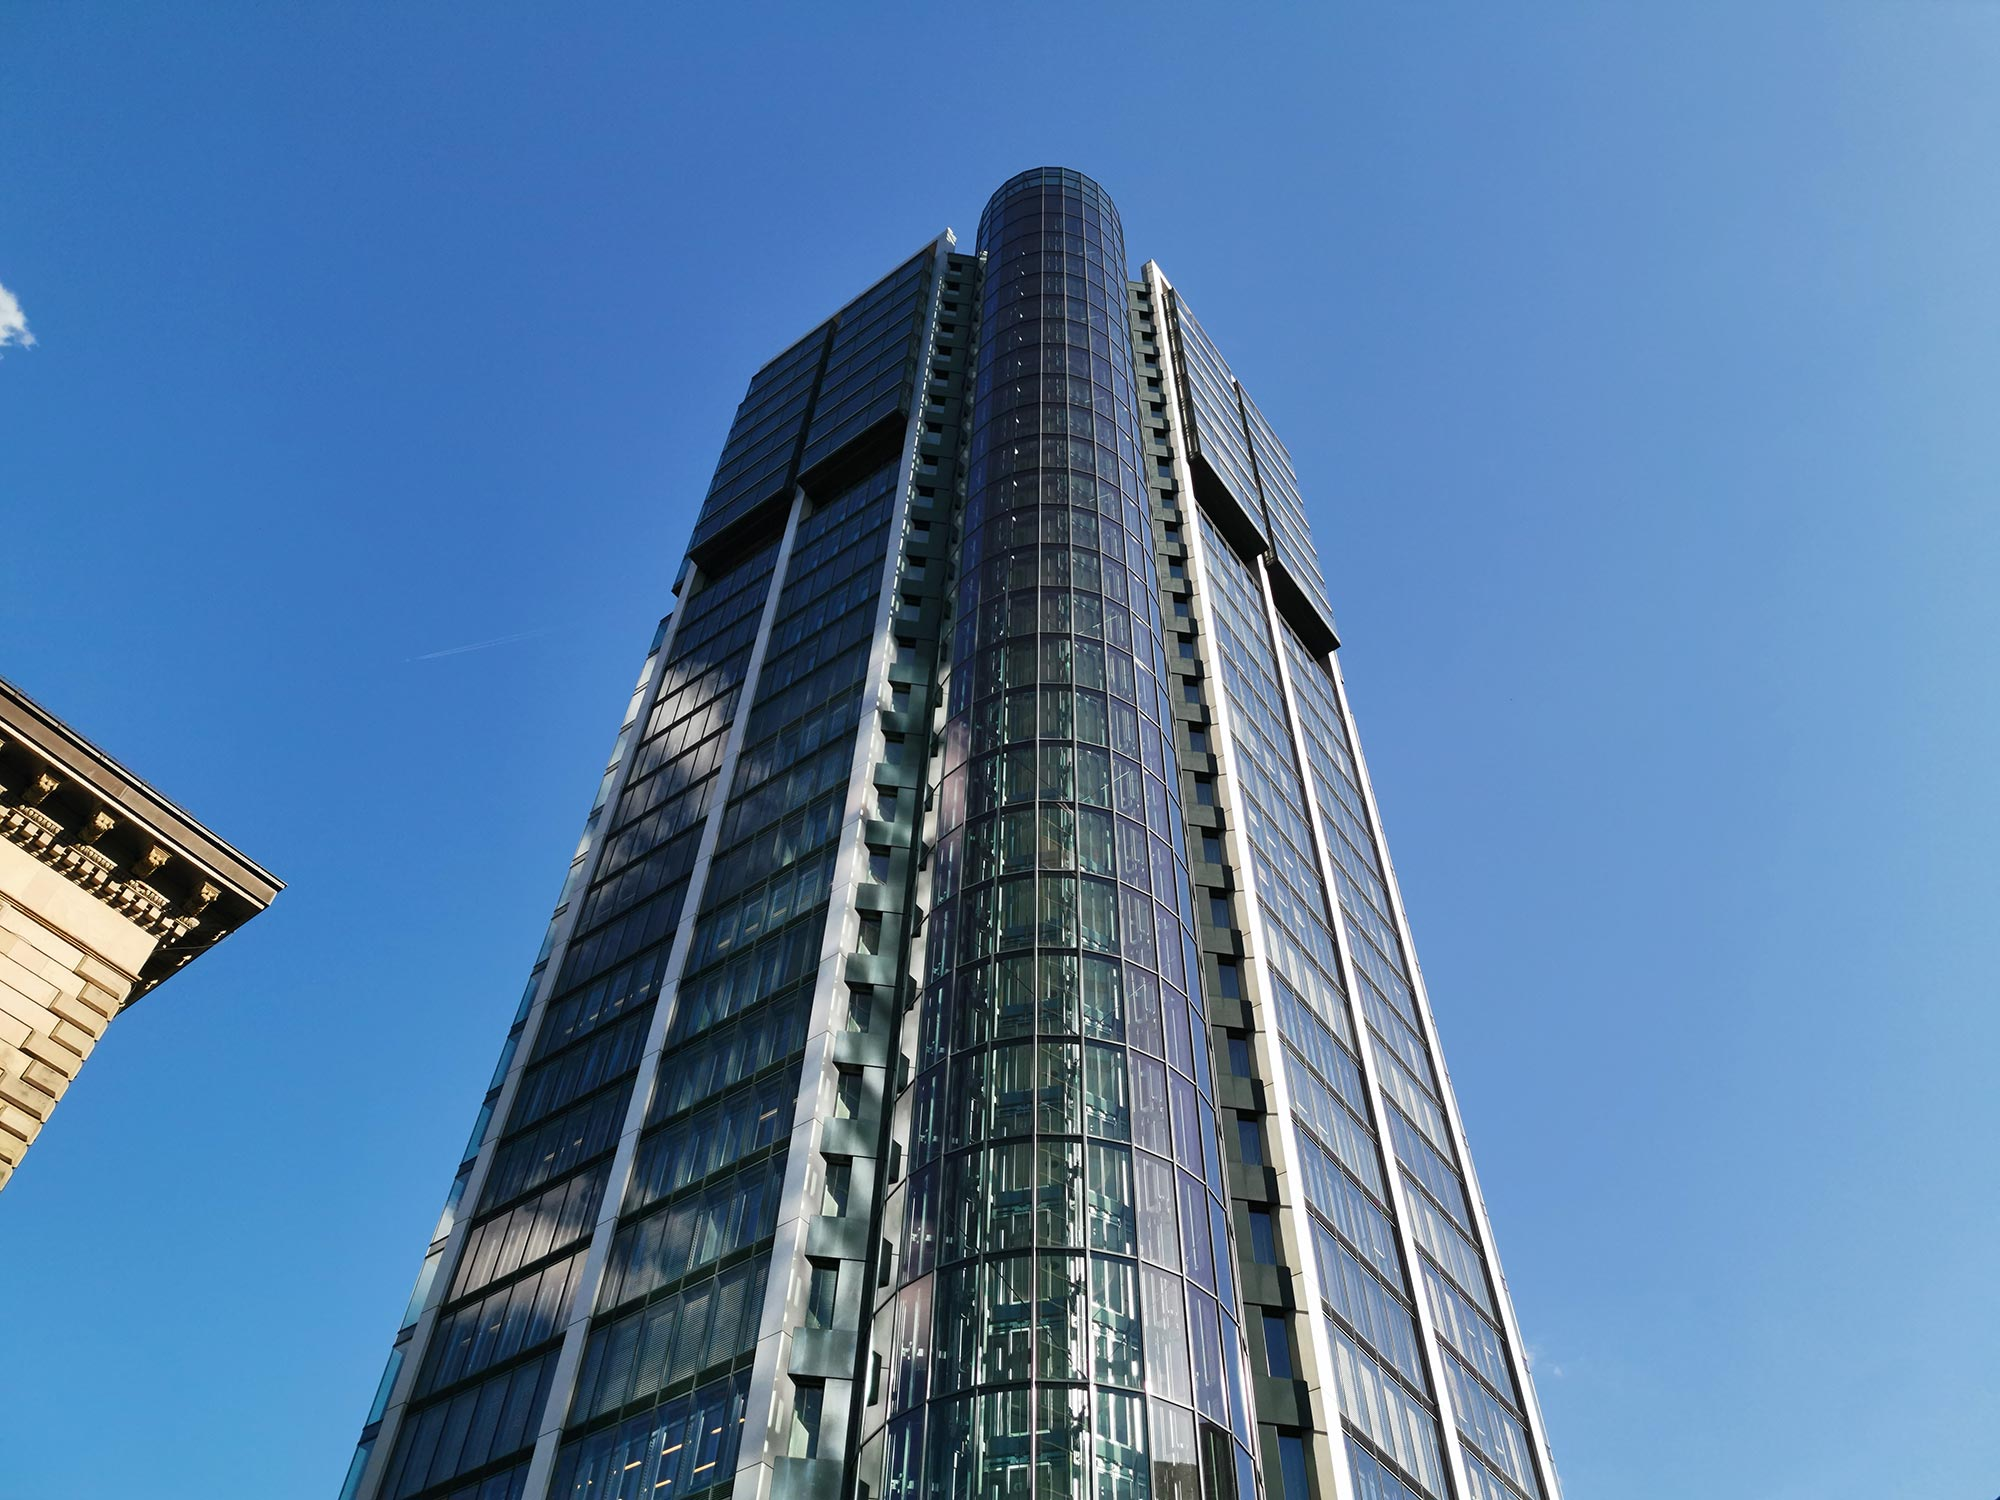 Eurotheum Hochhaus Frankfurt am Main - Fassade vom Hochhausturm